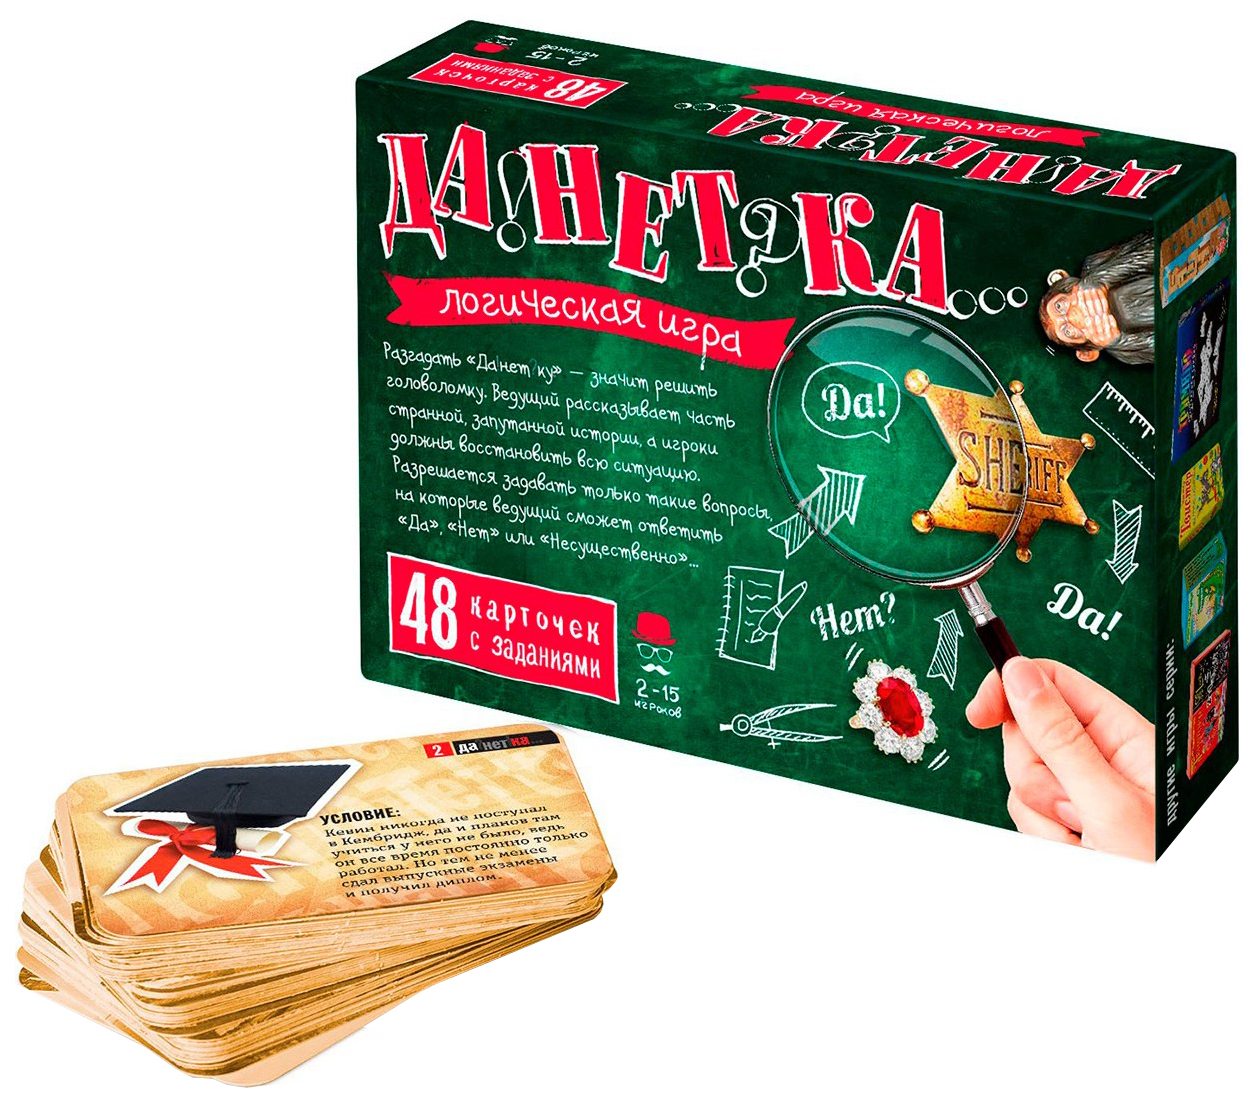 Семейная настольная игра Бэмби ДаНетка